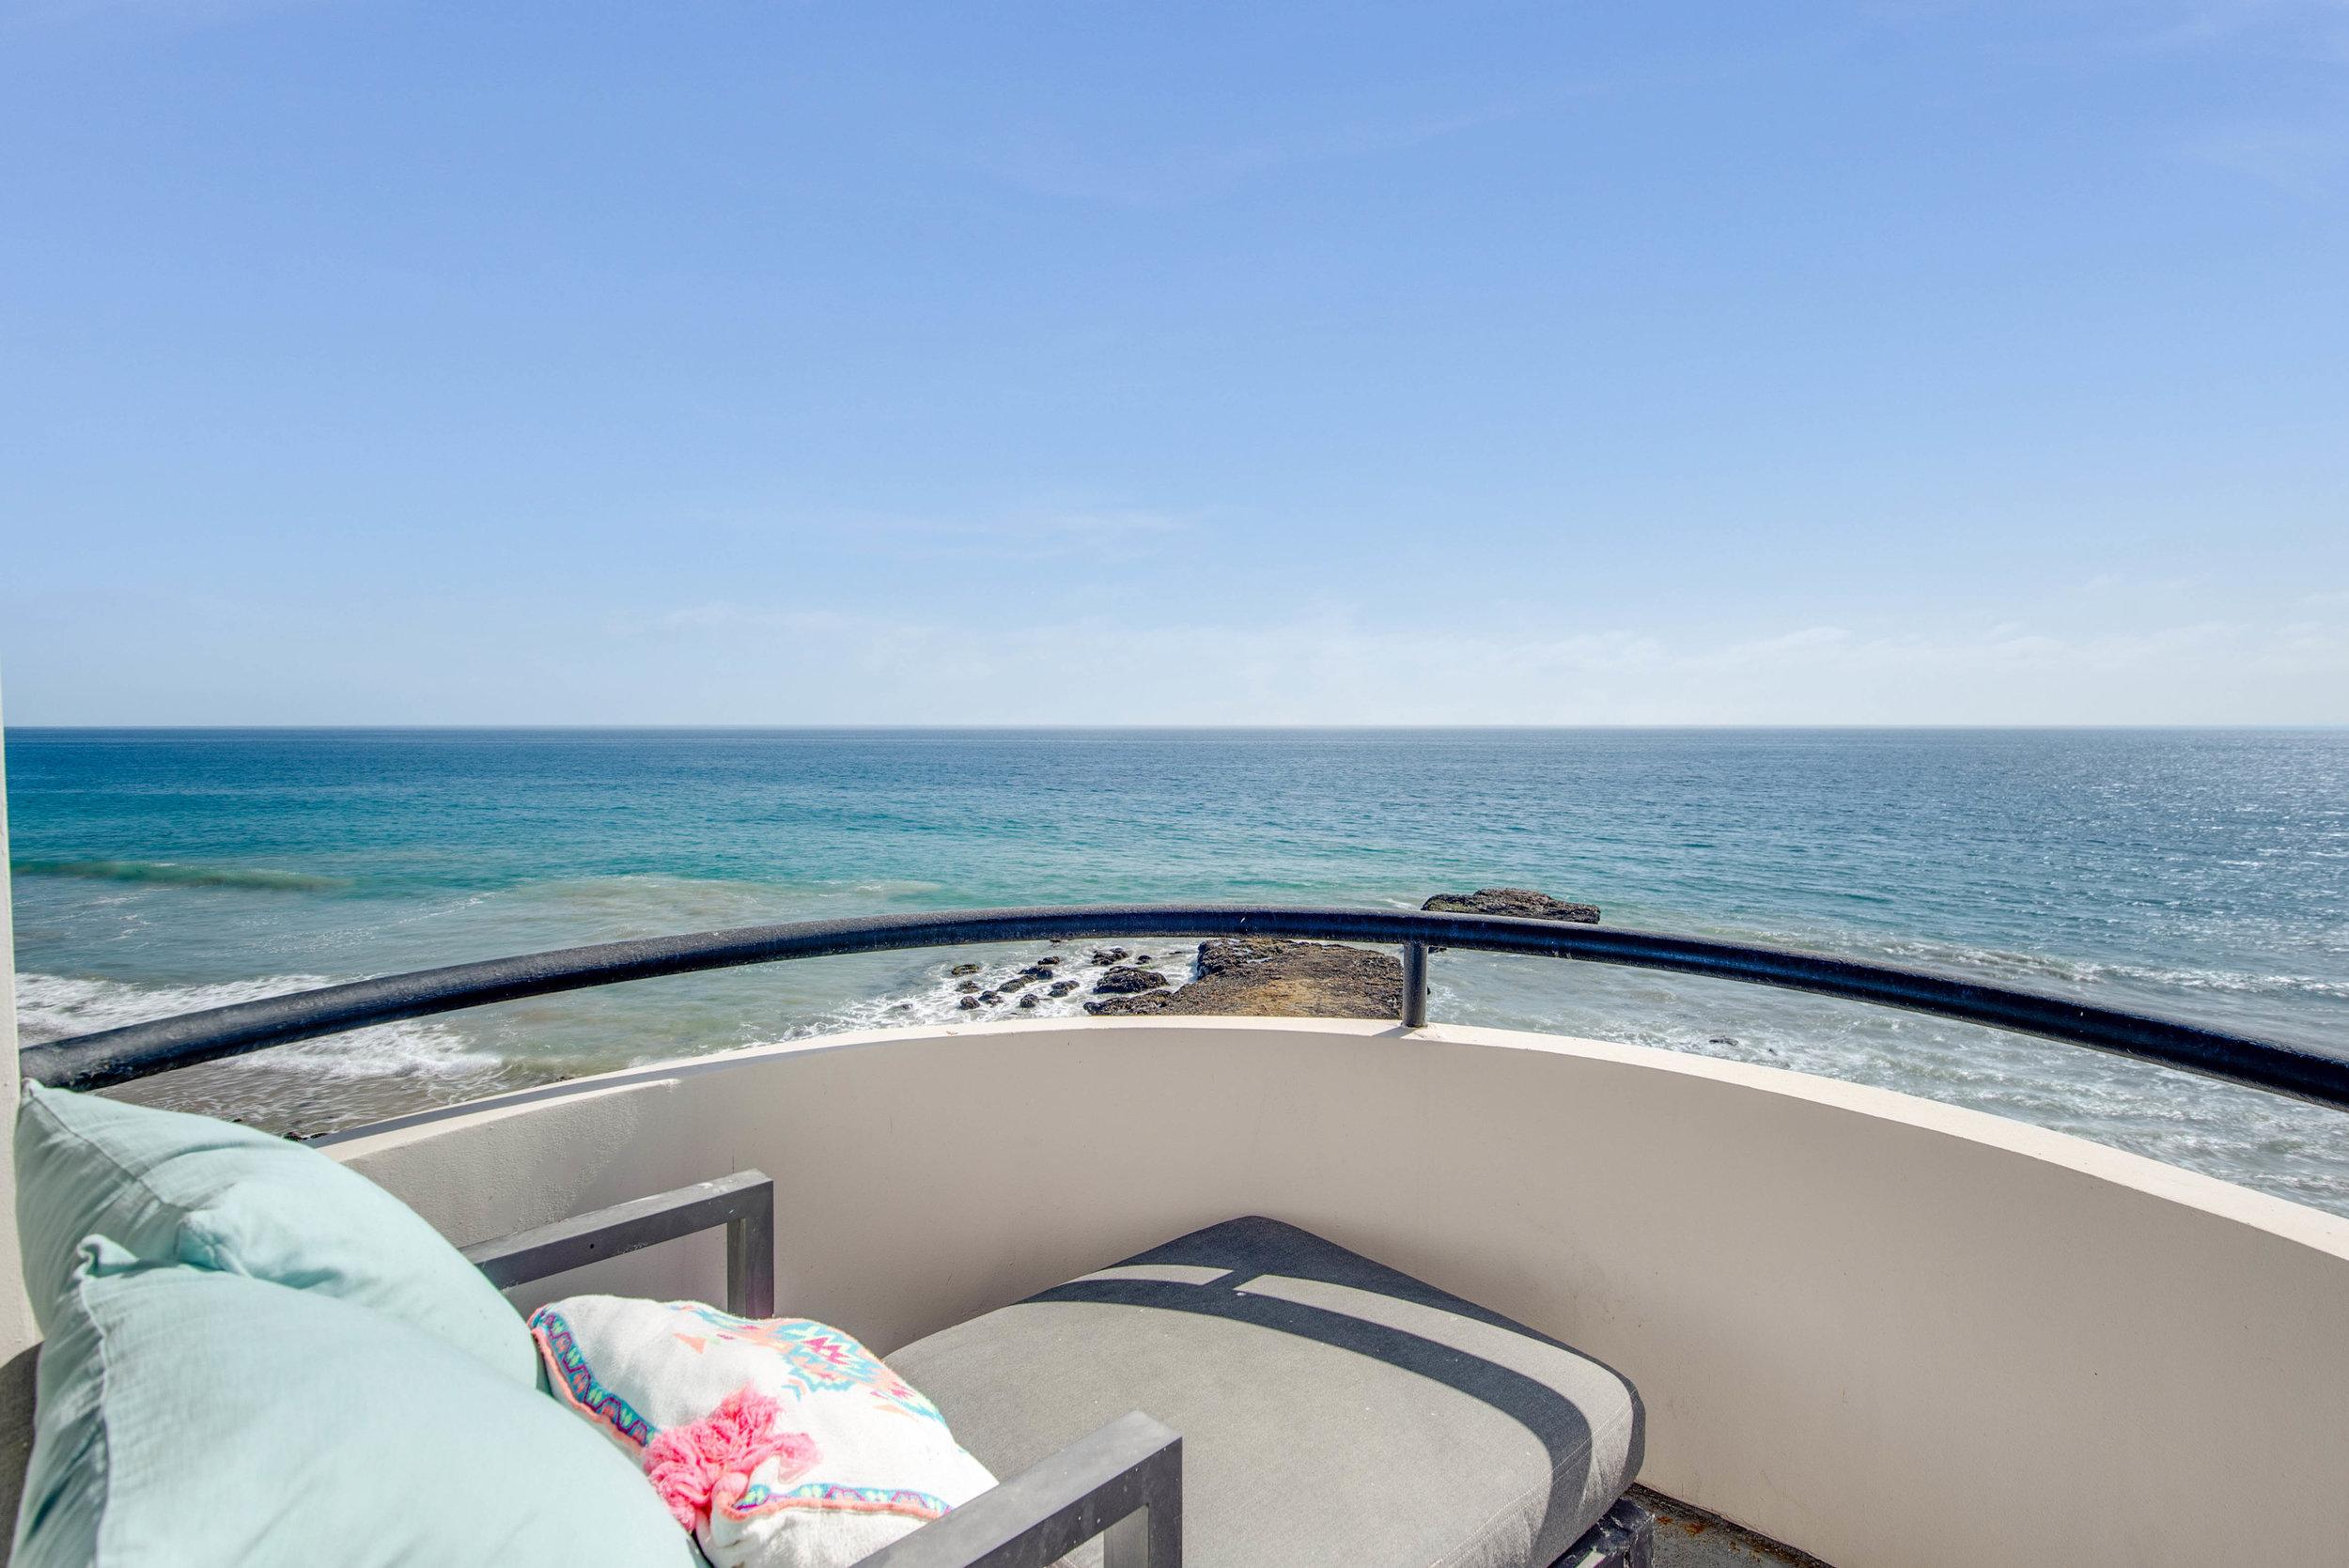 001 Ocean View 25252 Malibu Road For Sale Lease The Malibu Life Team Luxury Real Estate.jpg